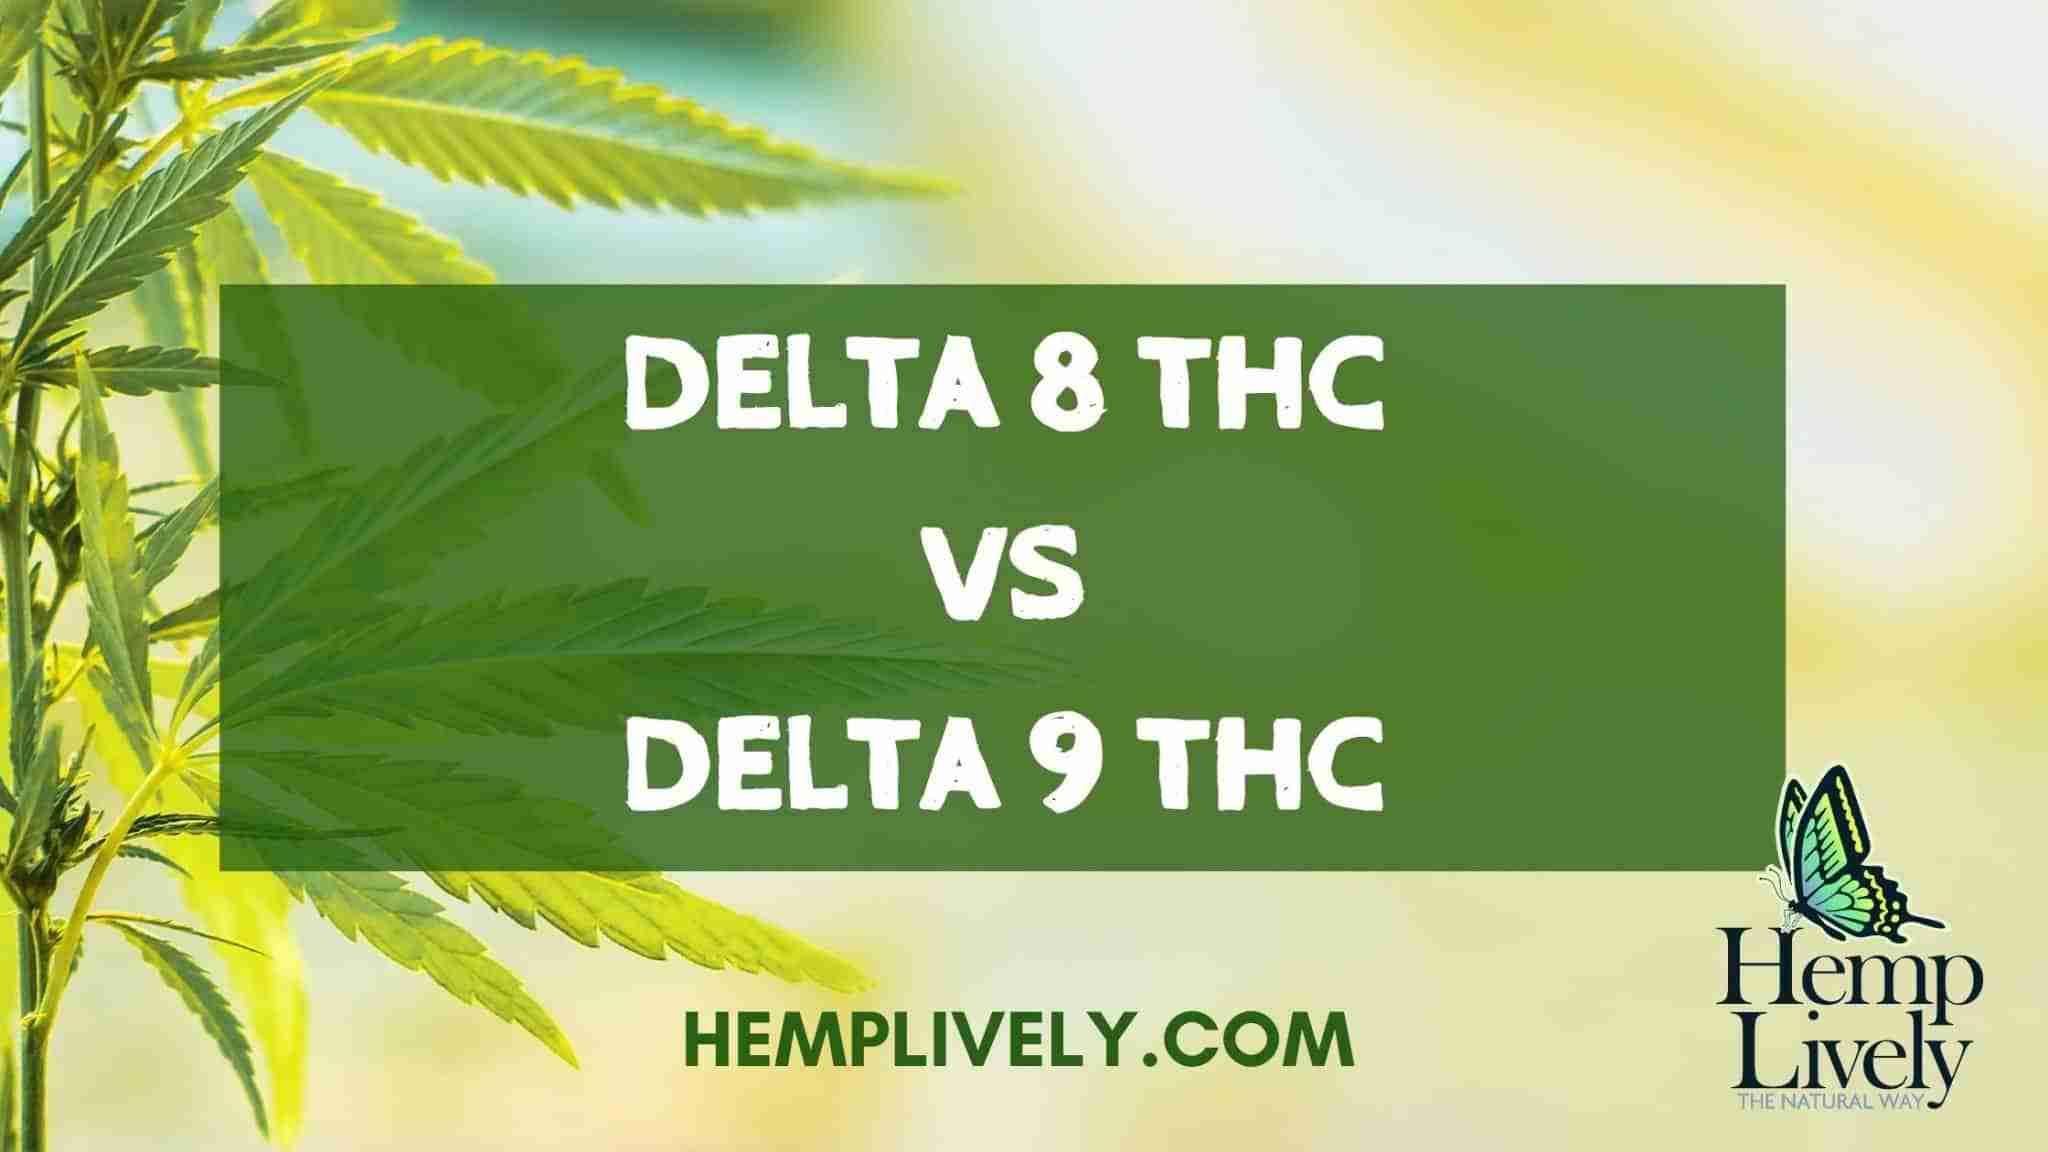 Getting To Know Delta 8 THC: Delta 8 THC vs Delta 9 THC?